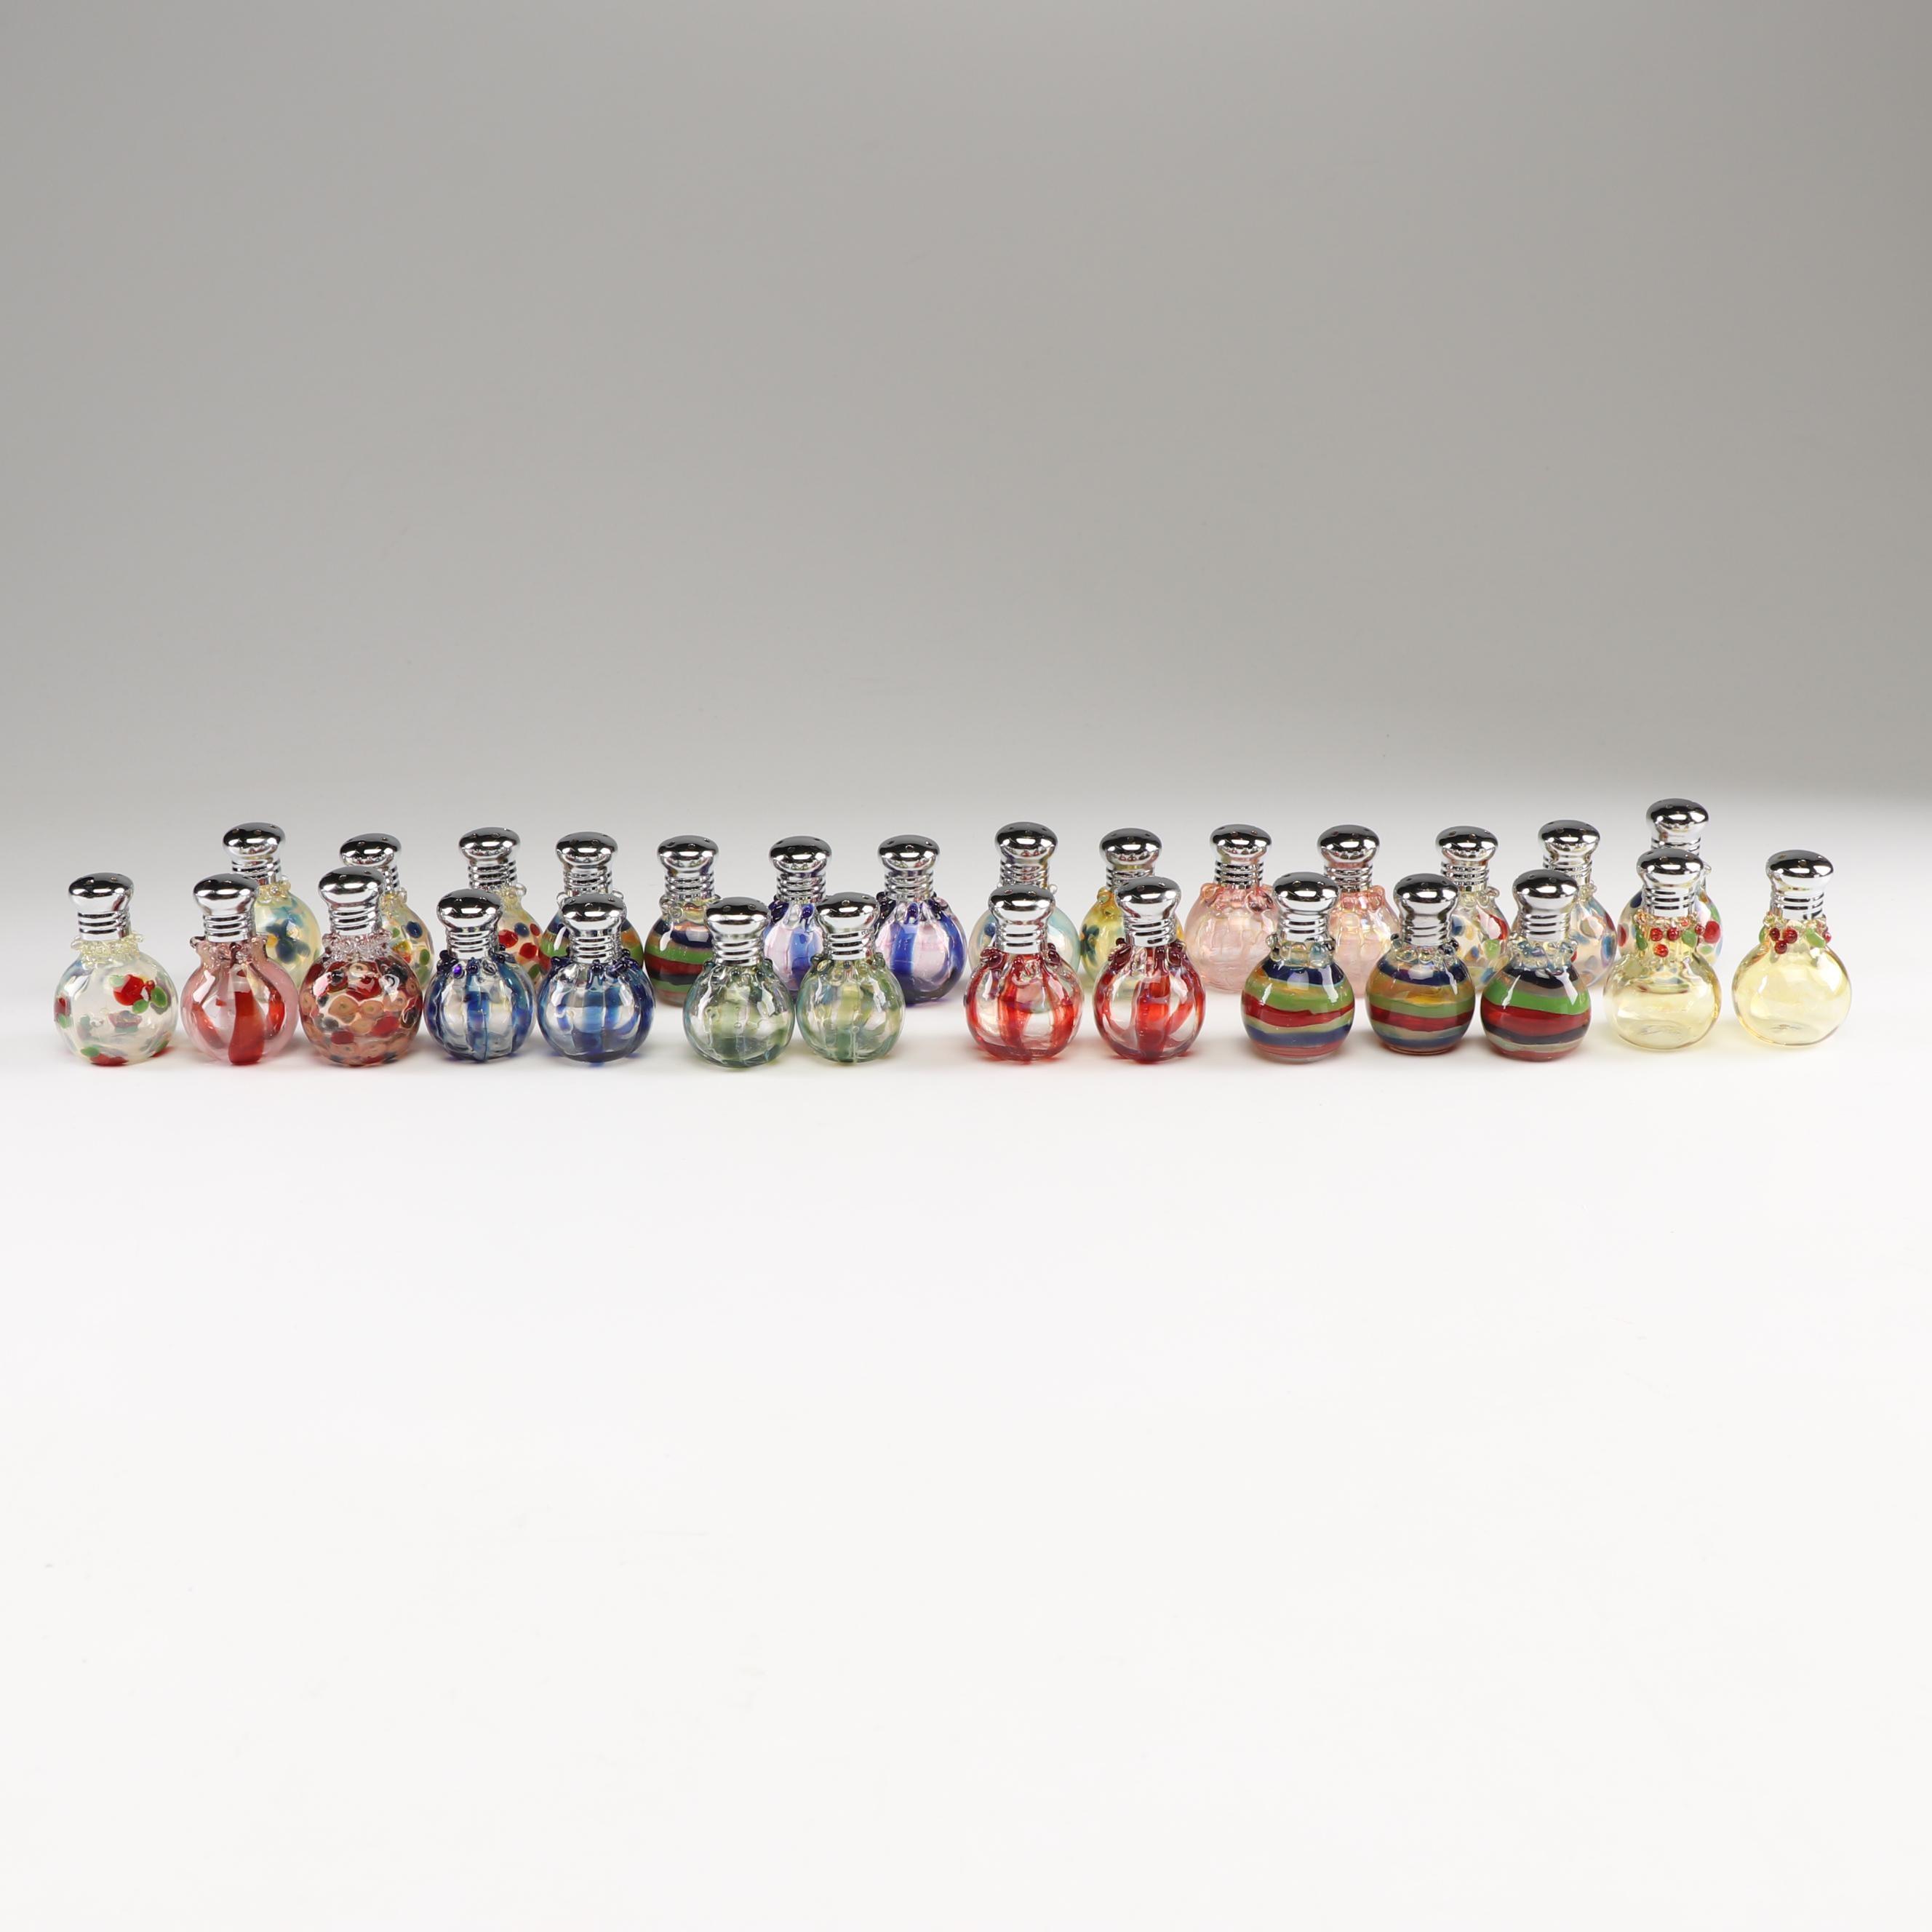 Handblown Art Glass Salt and Pepper Shakers, Late 20th Century